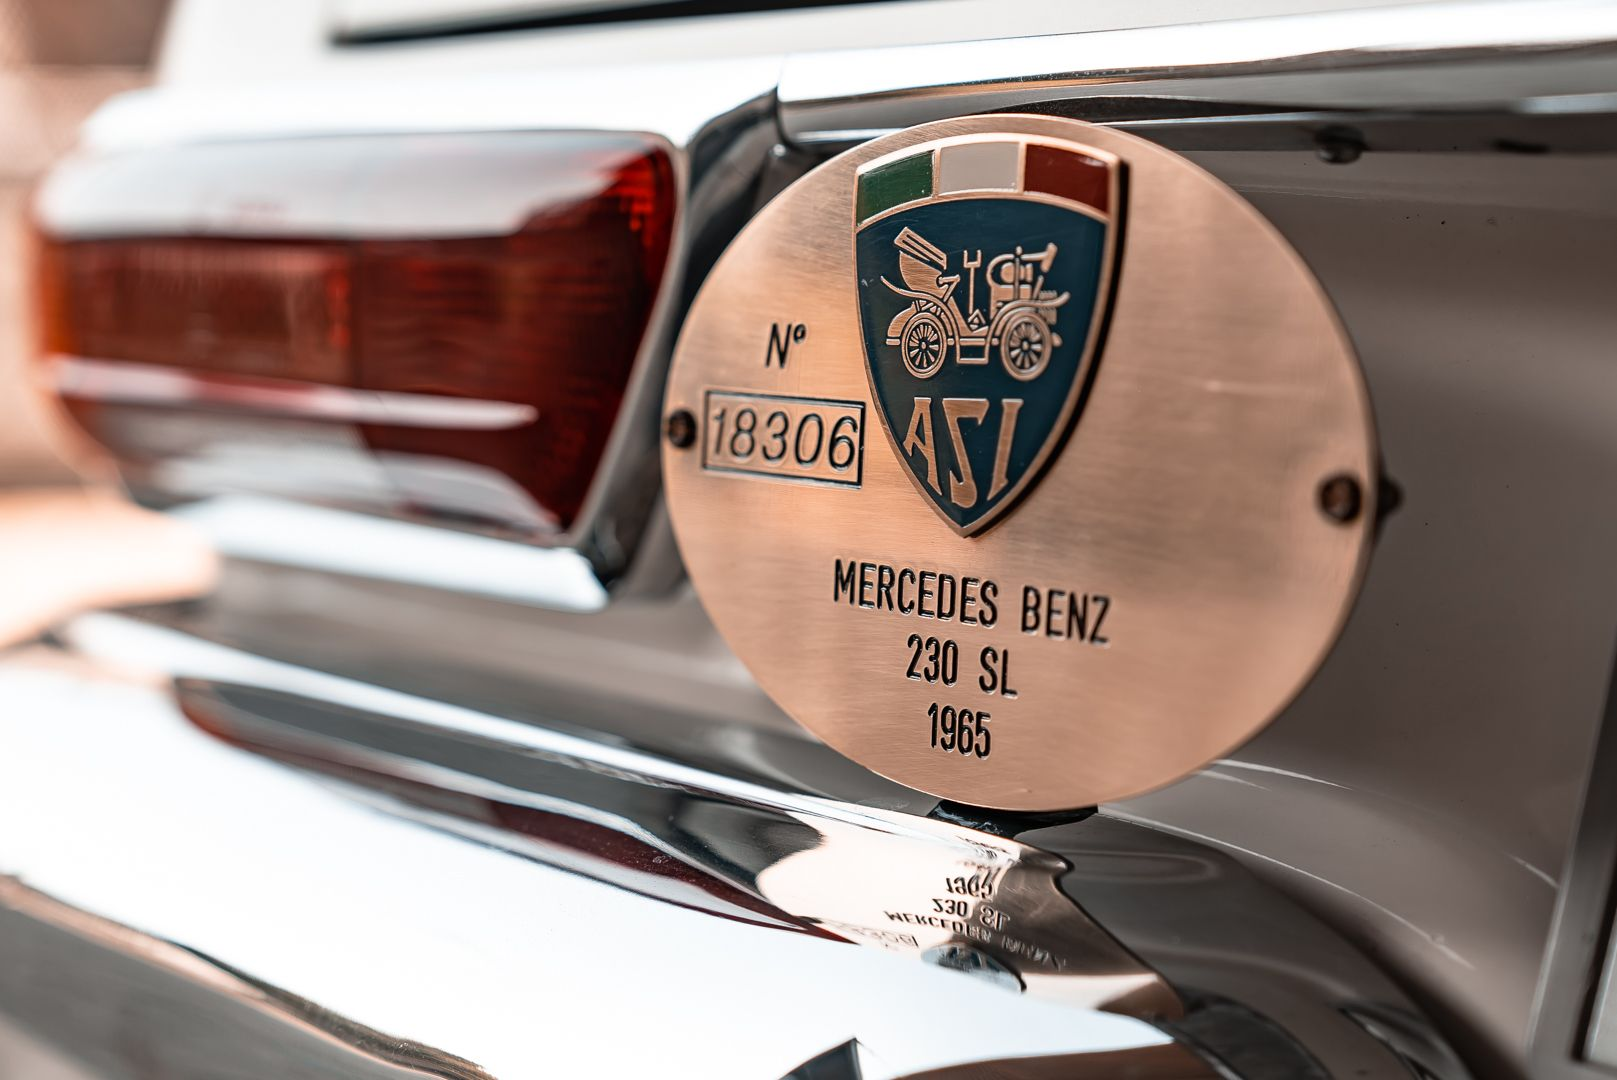 1965 Mercedes-Benz SL230 Pagoda 78535